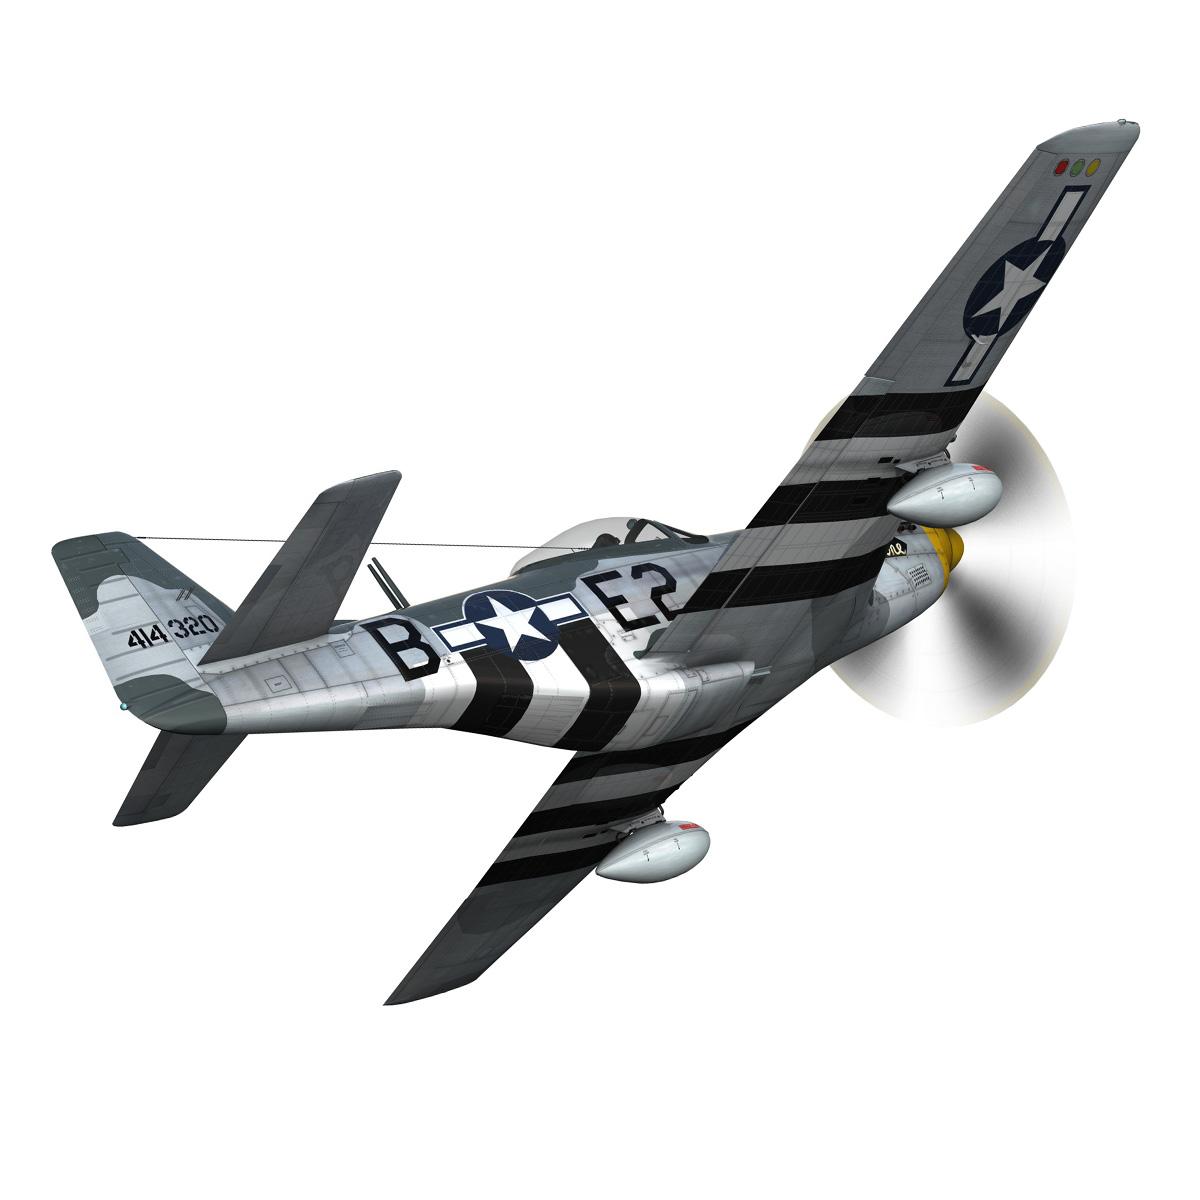 North American P-51D - Geraldine 3d model fbx c4d lwo obj 265942